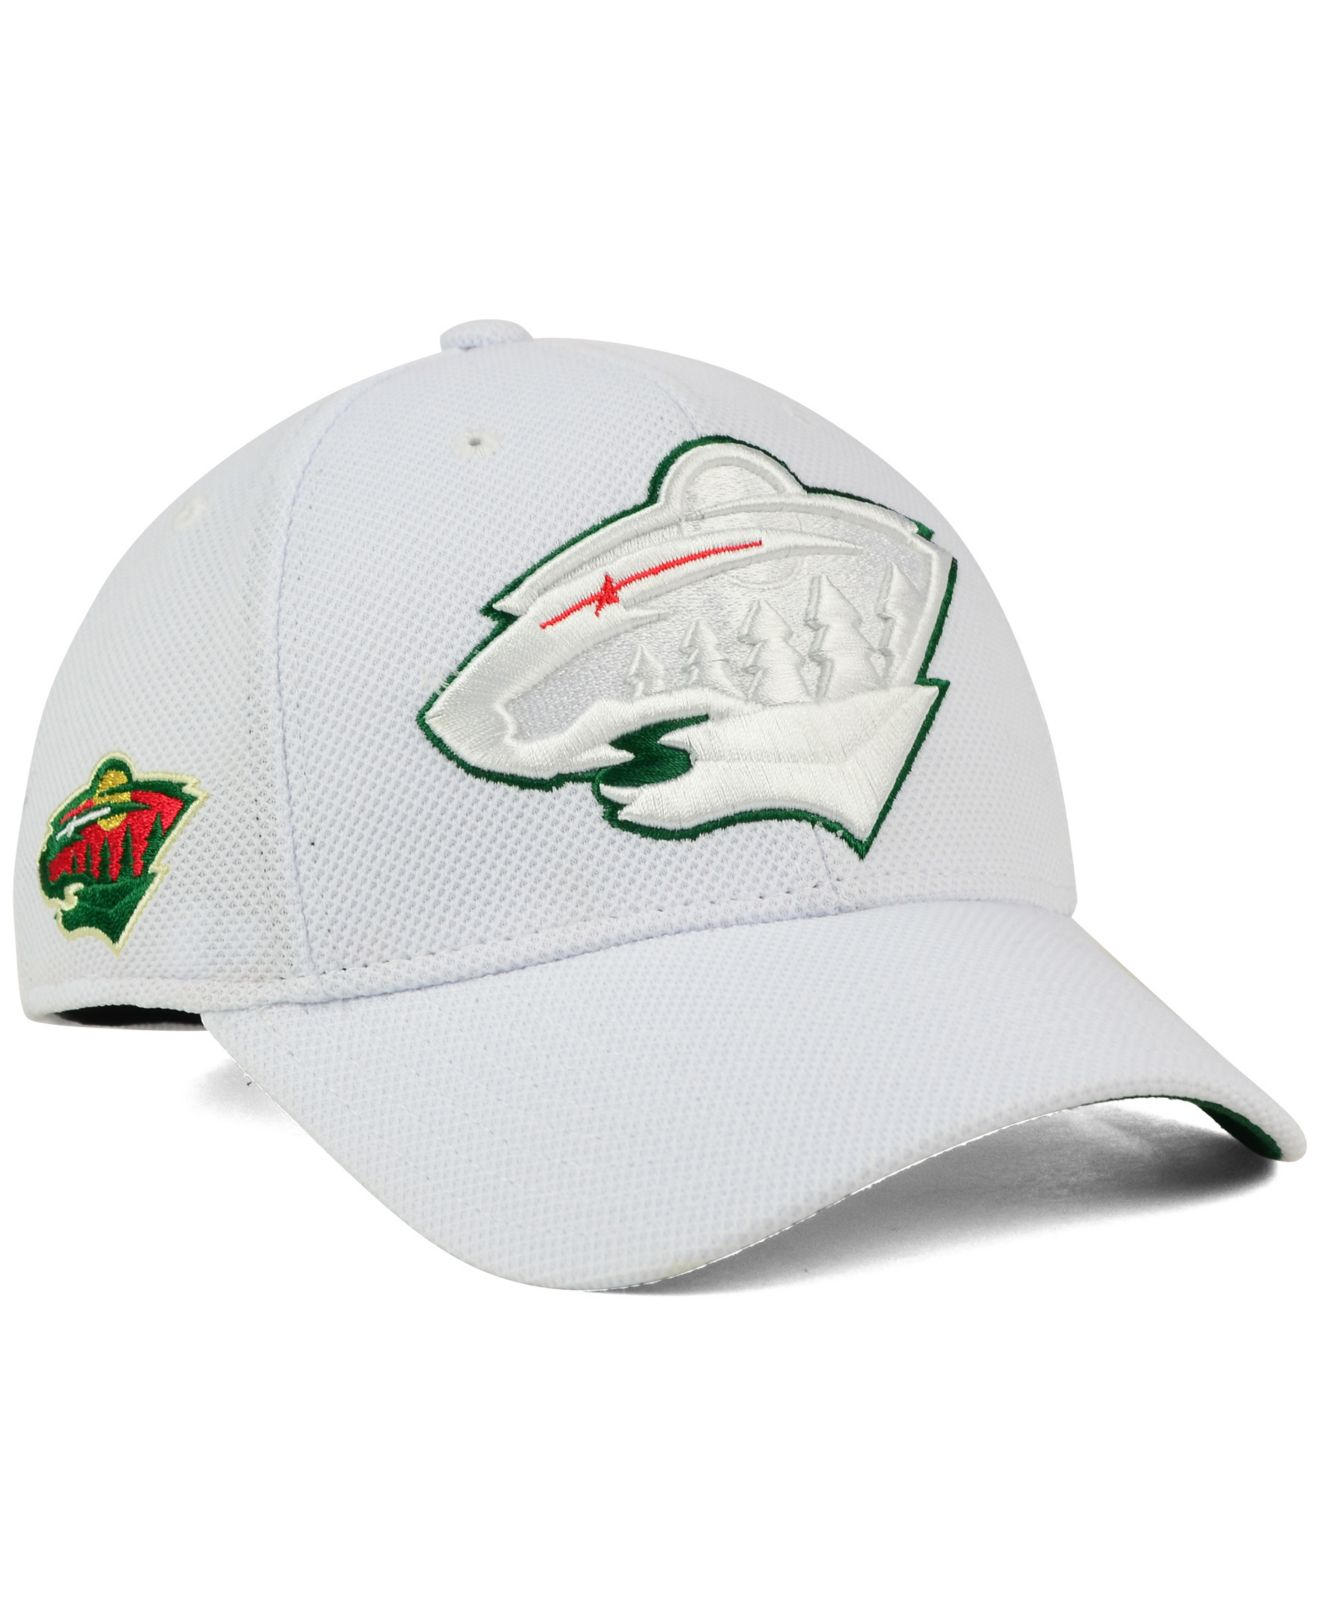 huge selection of 01433 cf711 ... italy lyst reebok minnesota wild 2nd season flex cap in white for men  17a10 4581e